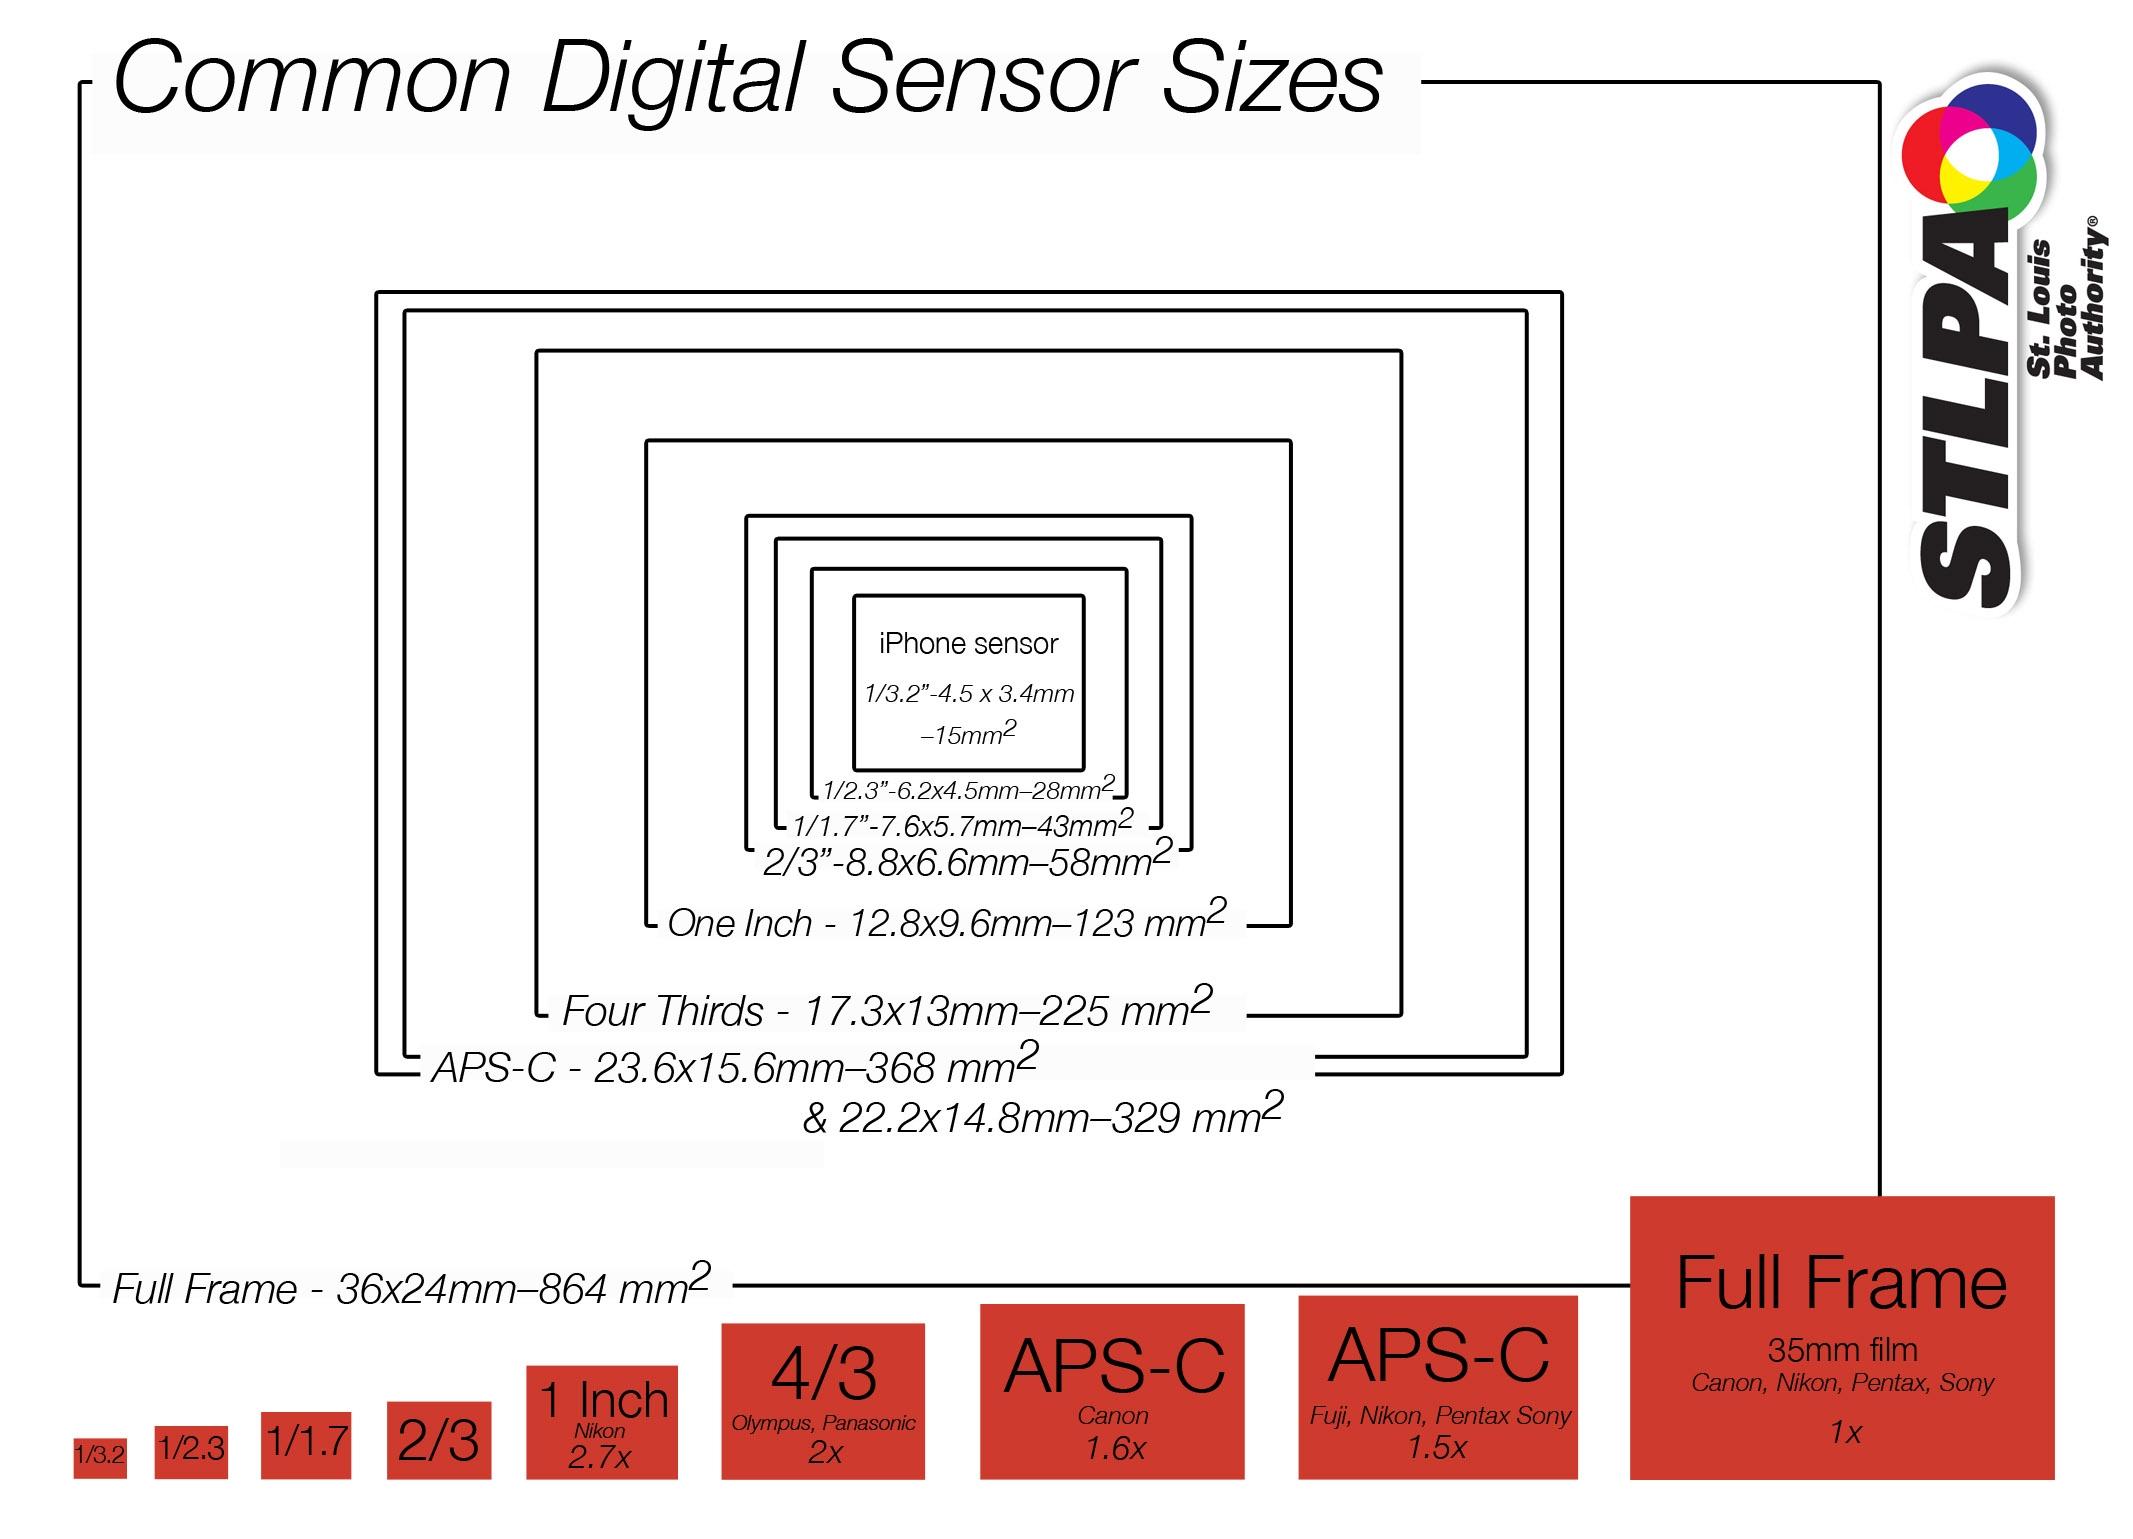 Chart of Common Digital Sensor Sizes